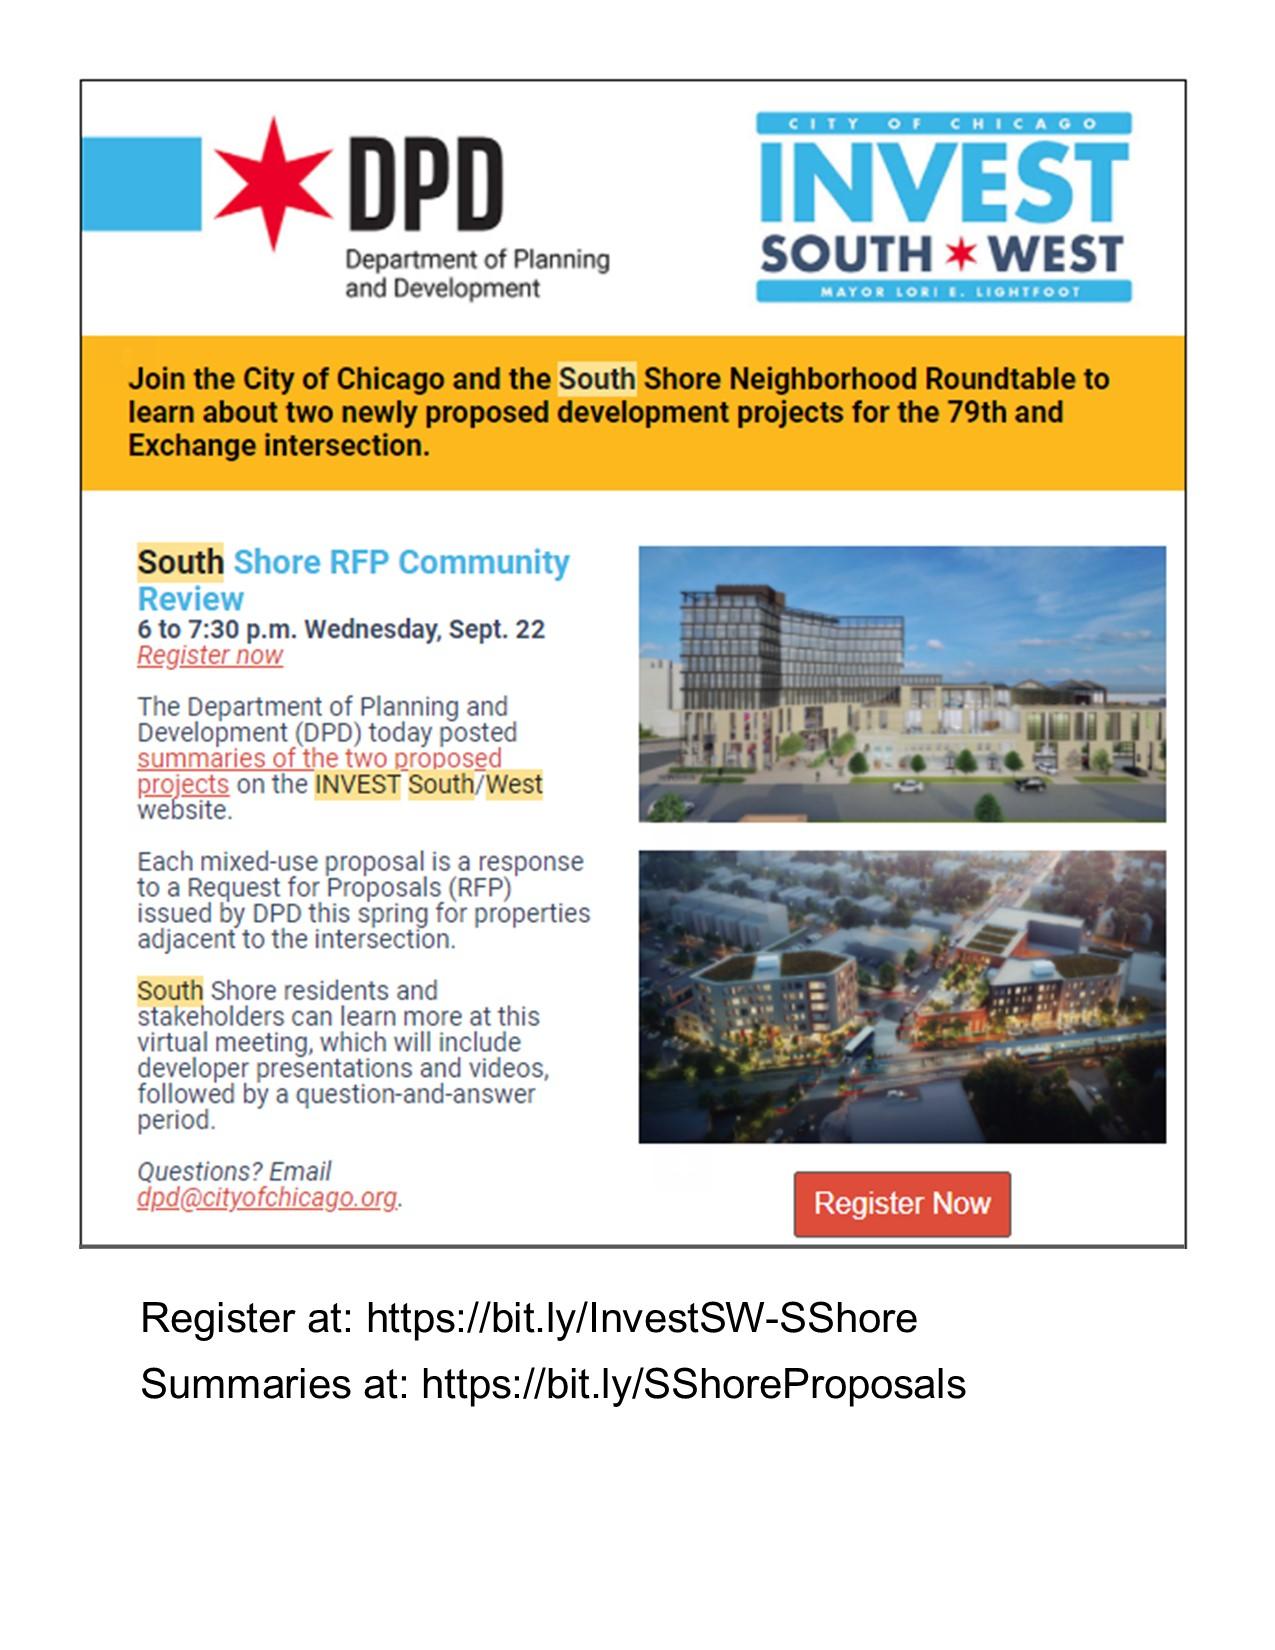 South Shore RFP Community Meeting 09-22-2021